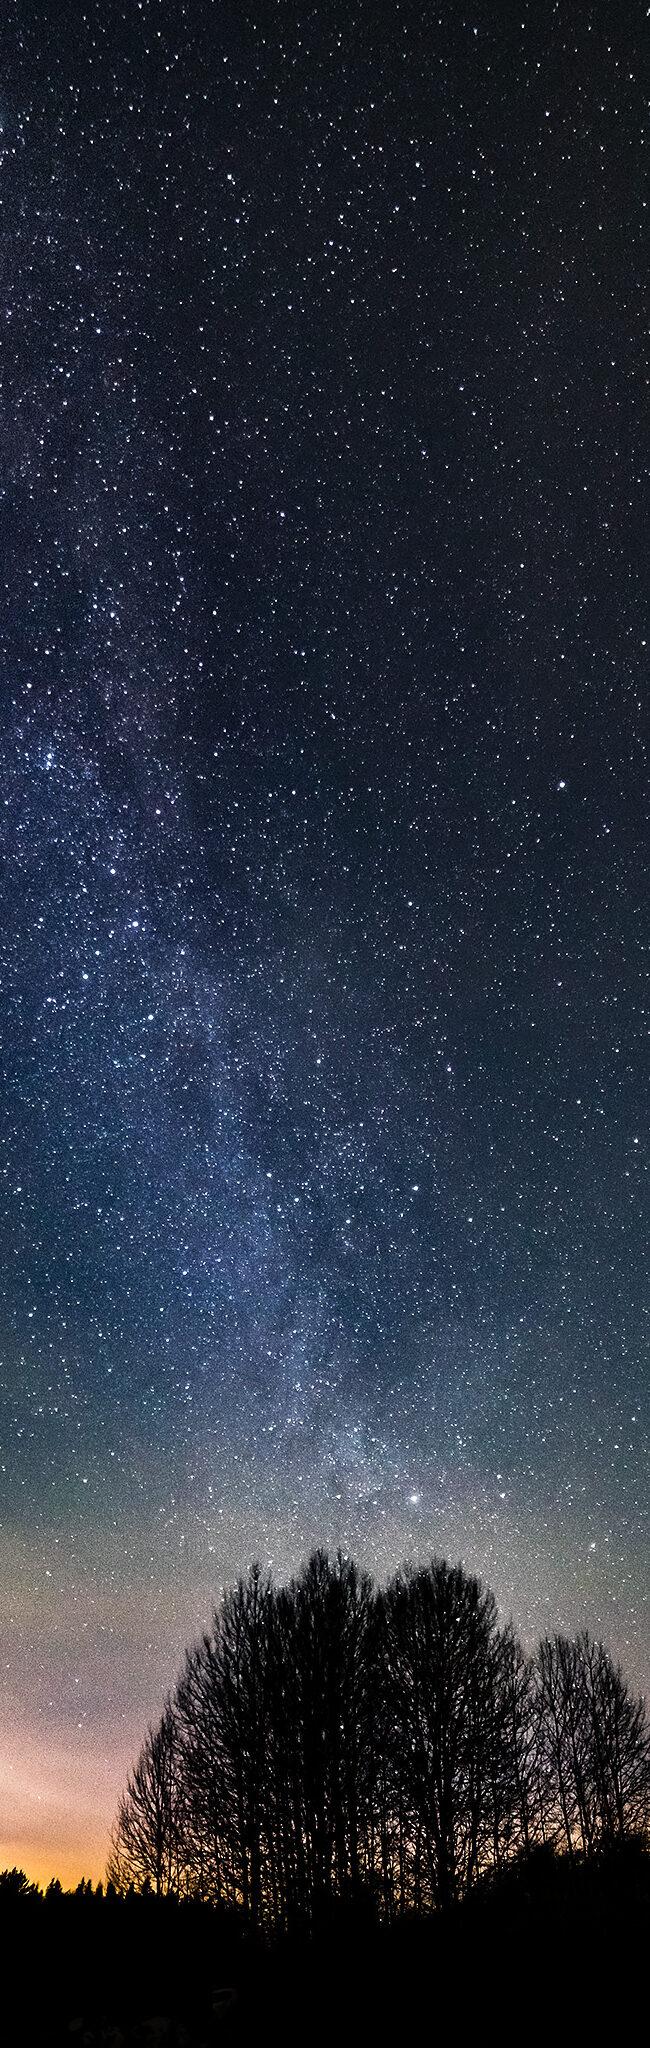 Vintergatan 2019